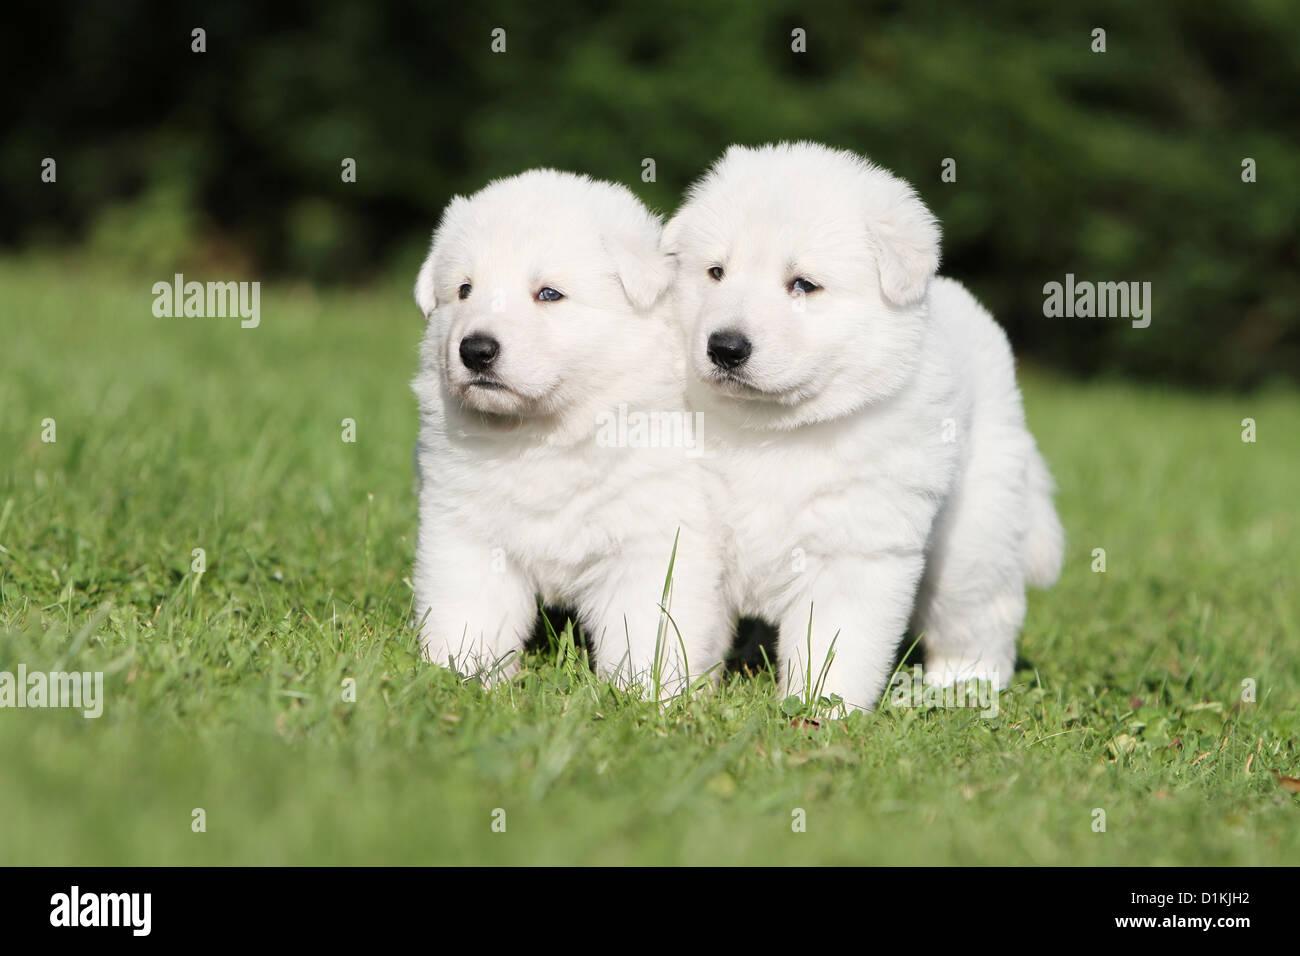 White Swiss Shepherd Dog Berger Blanc Suisse Two Puppies